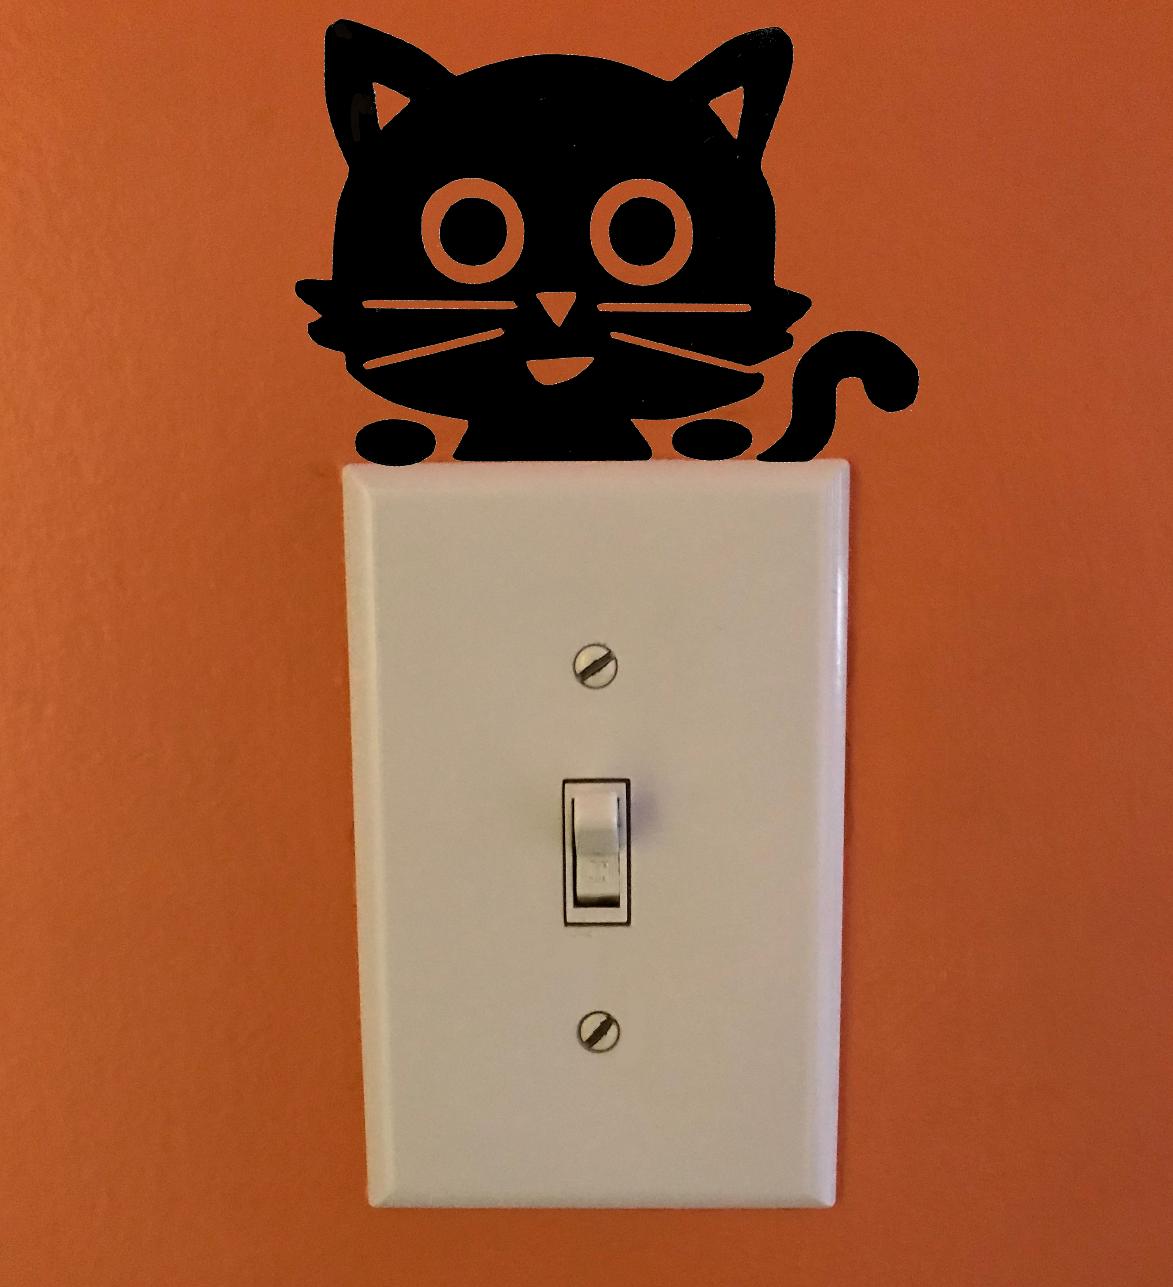 4 Pcs Cute Black Sleeping Cats Cartoon Wall Sticker Family Diy Decor Art Car Stickers Home